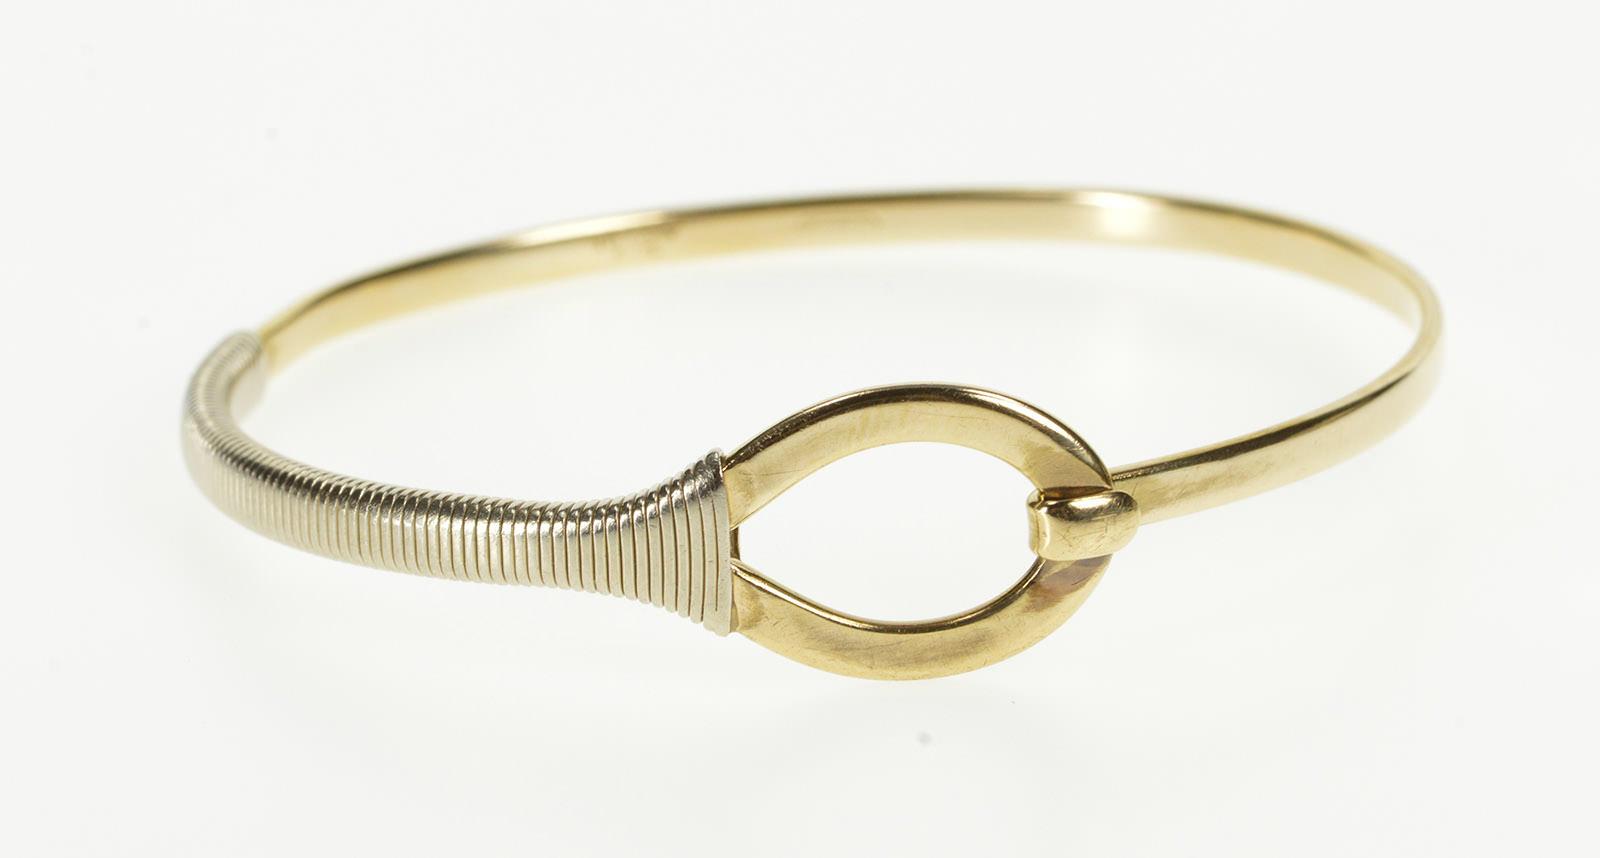 0a0364897 14K Tiffany & Co. Two Tone Loop Wrap Bangle Yellow Gold Bracelet ...